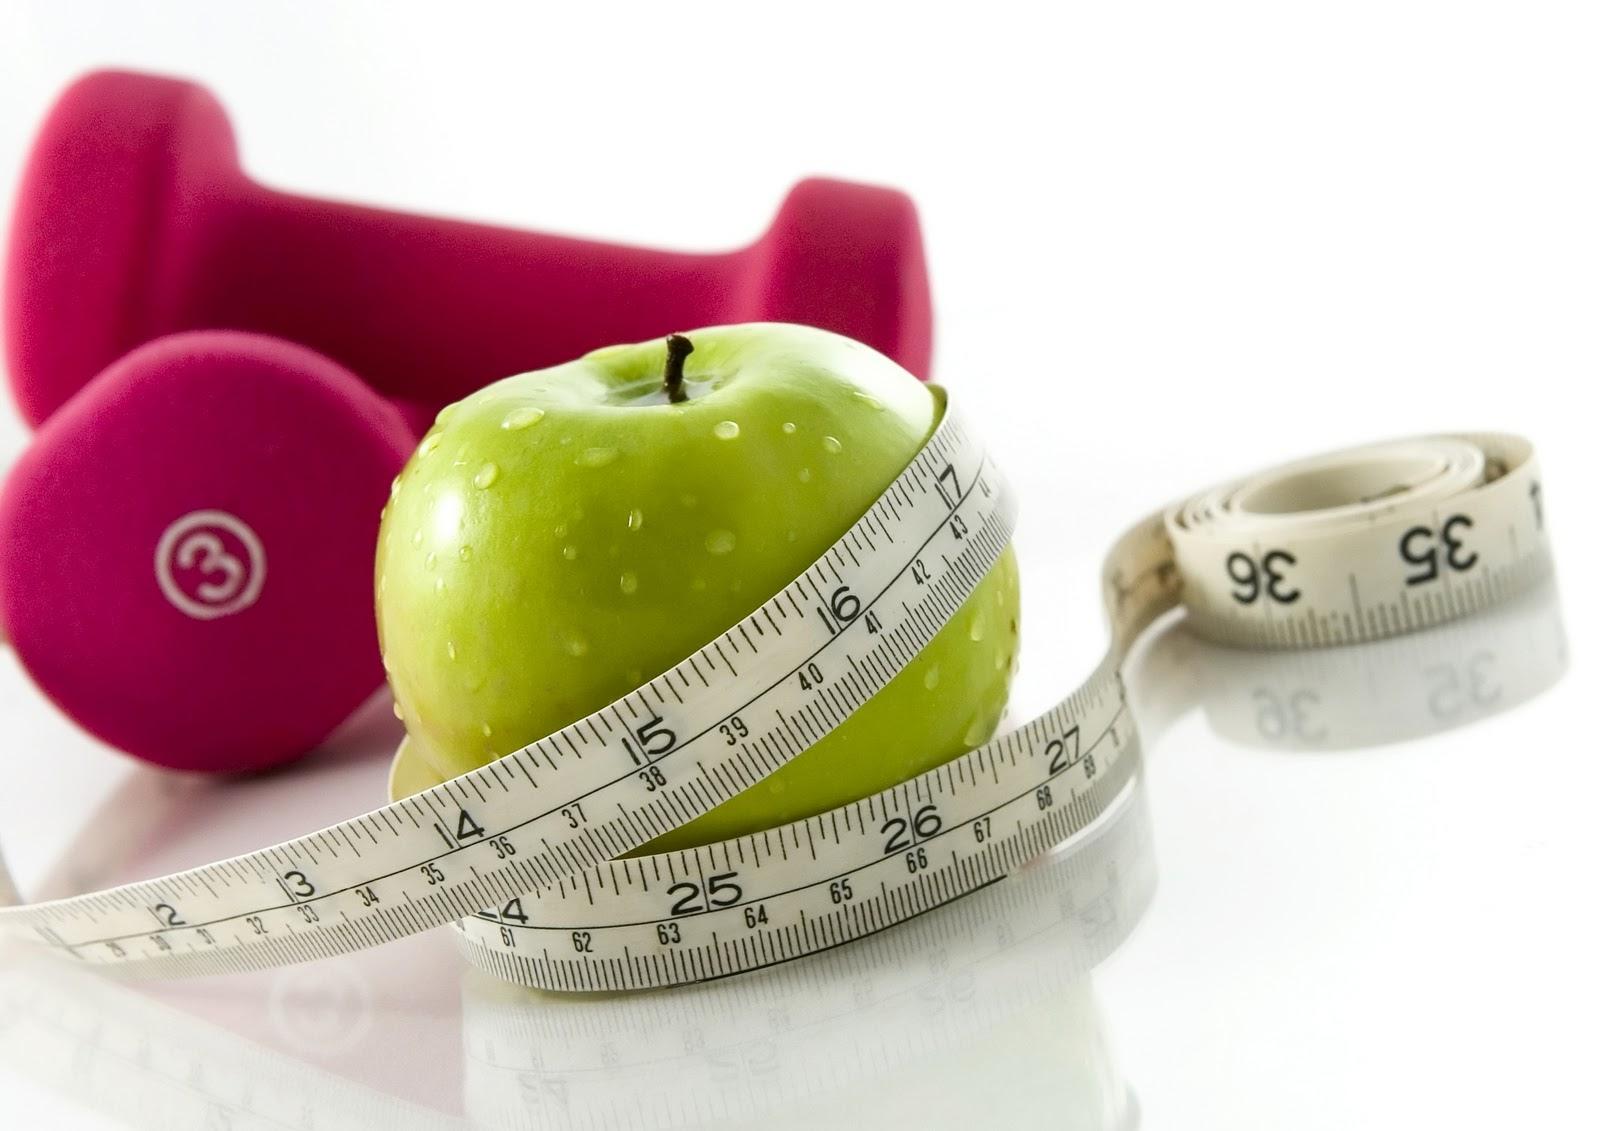 Australia's Healthy Weight Week